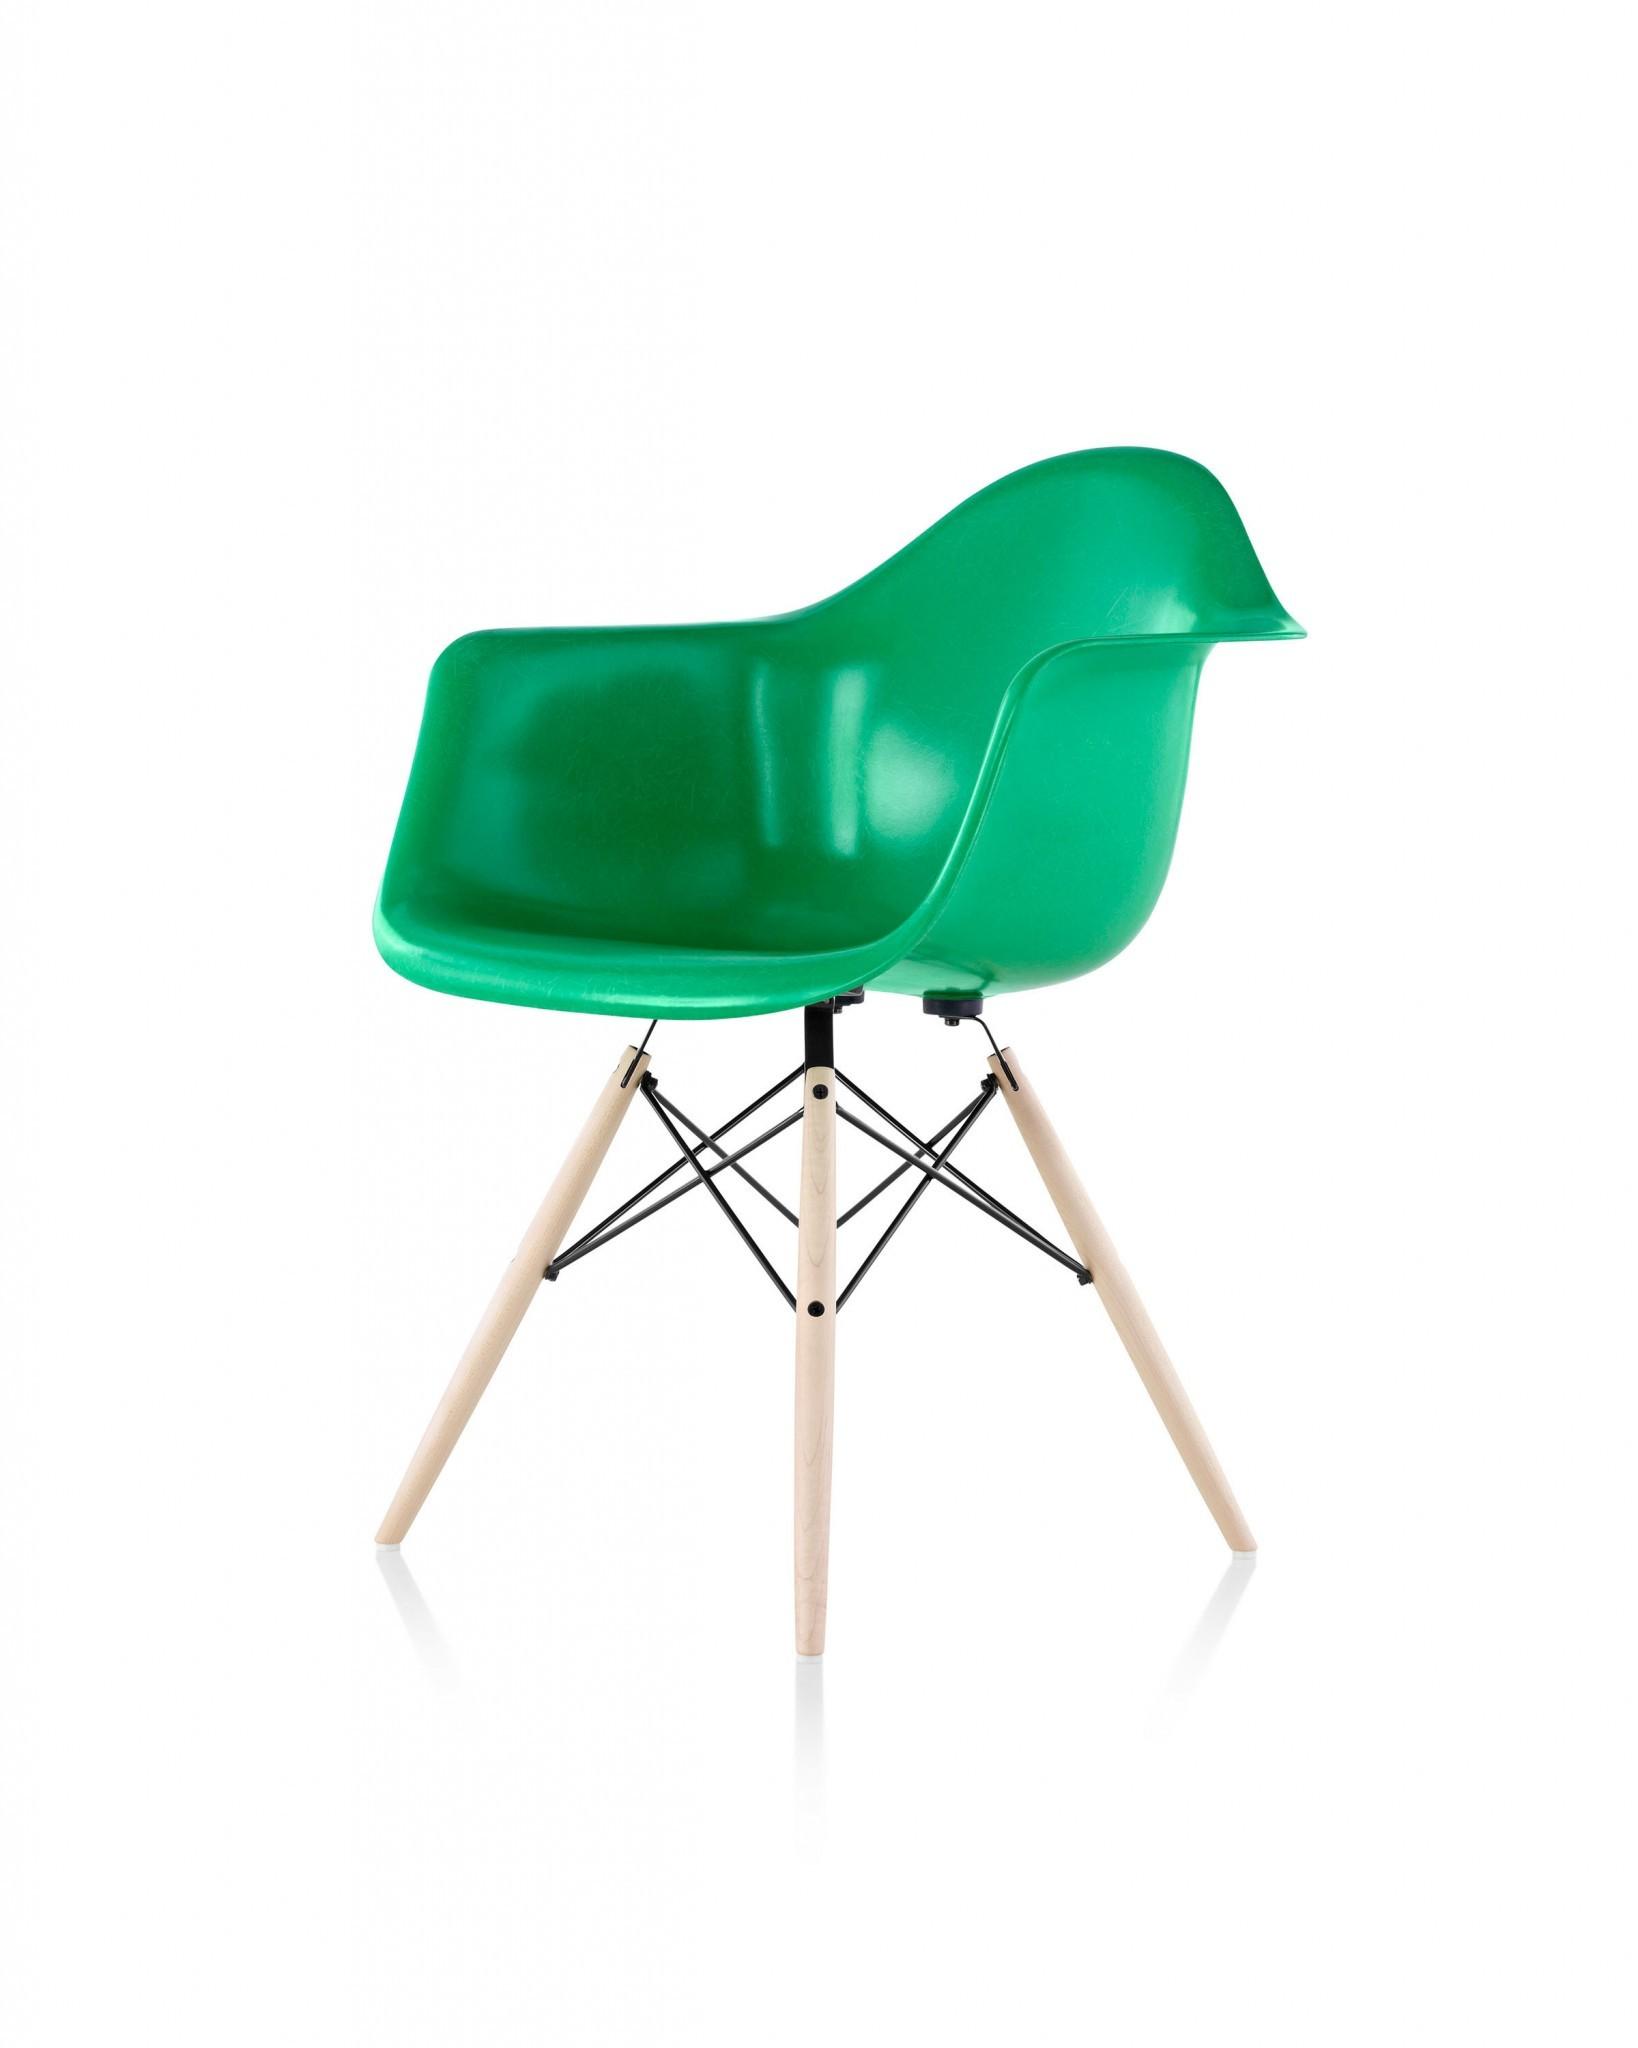 Herman Miller Eames Molded Fiberglass Armchair